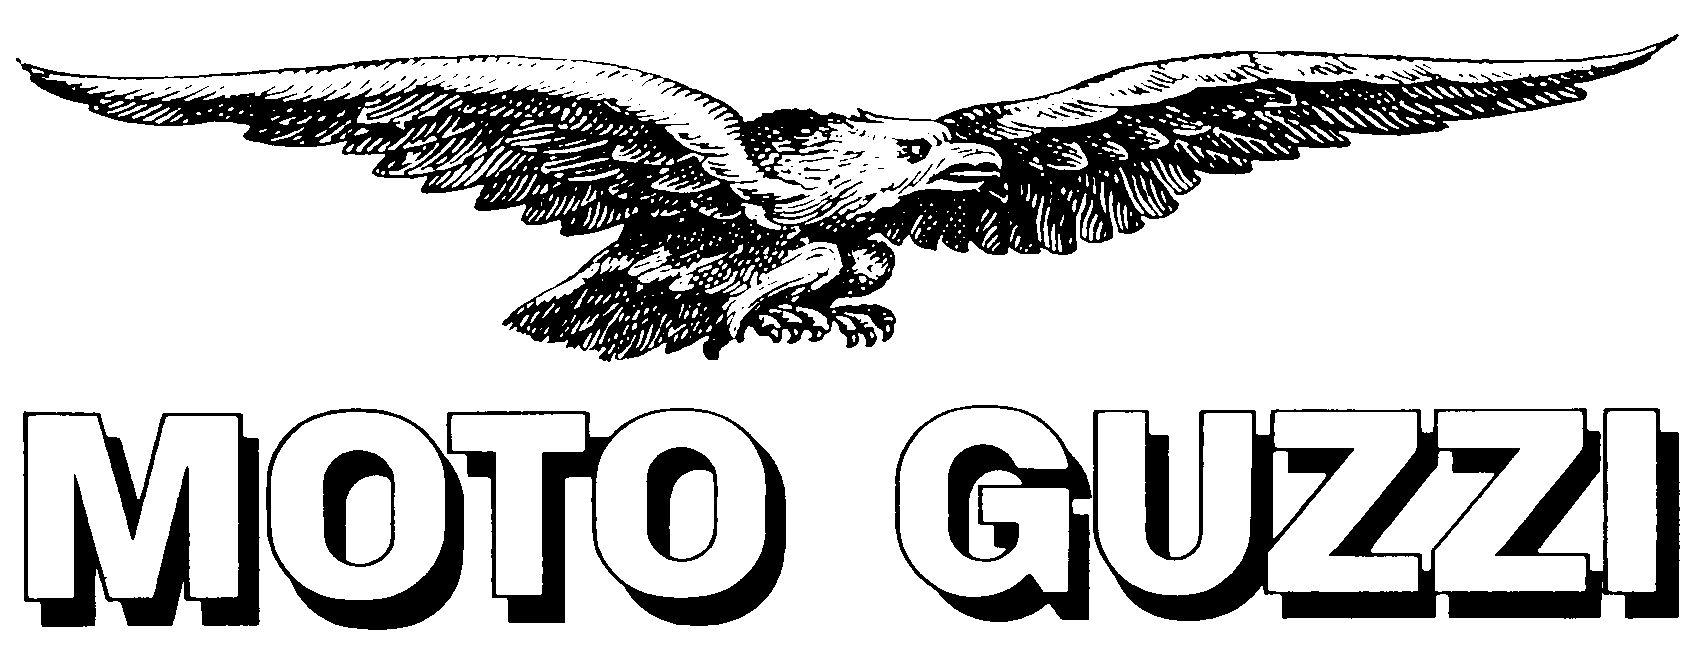 Moto Guzzi Emblem.